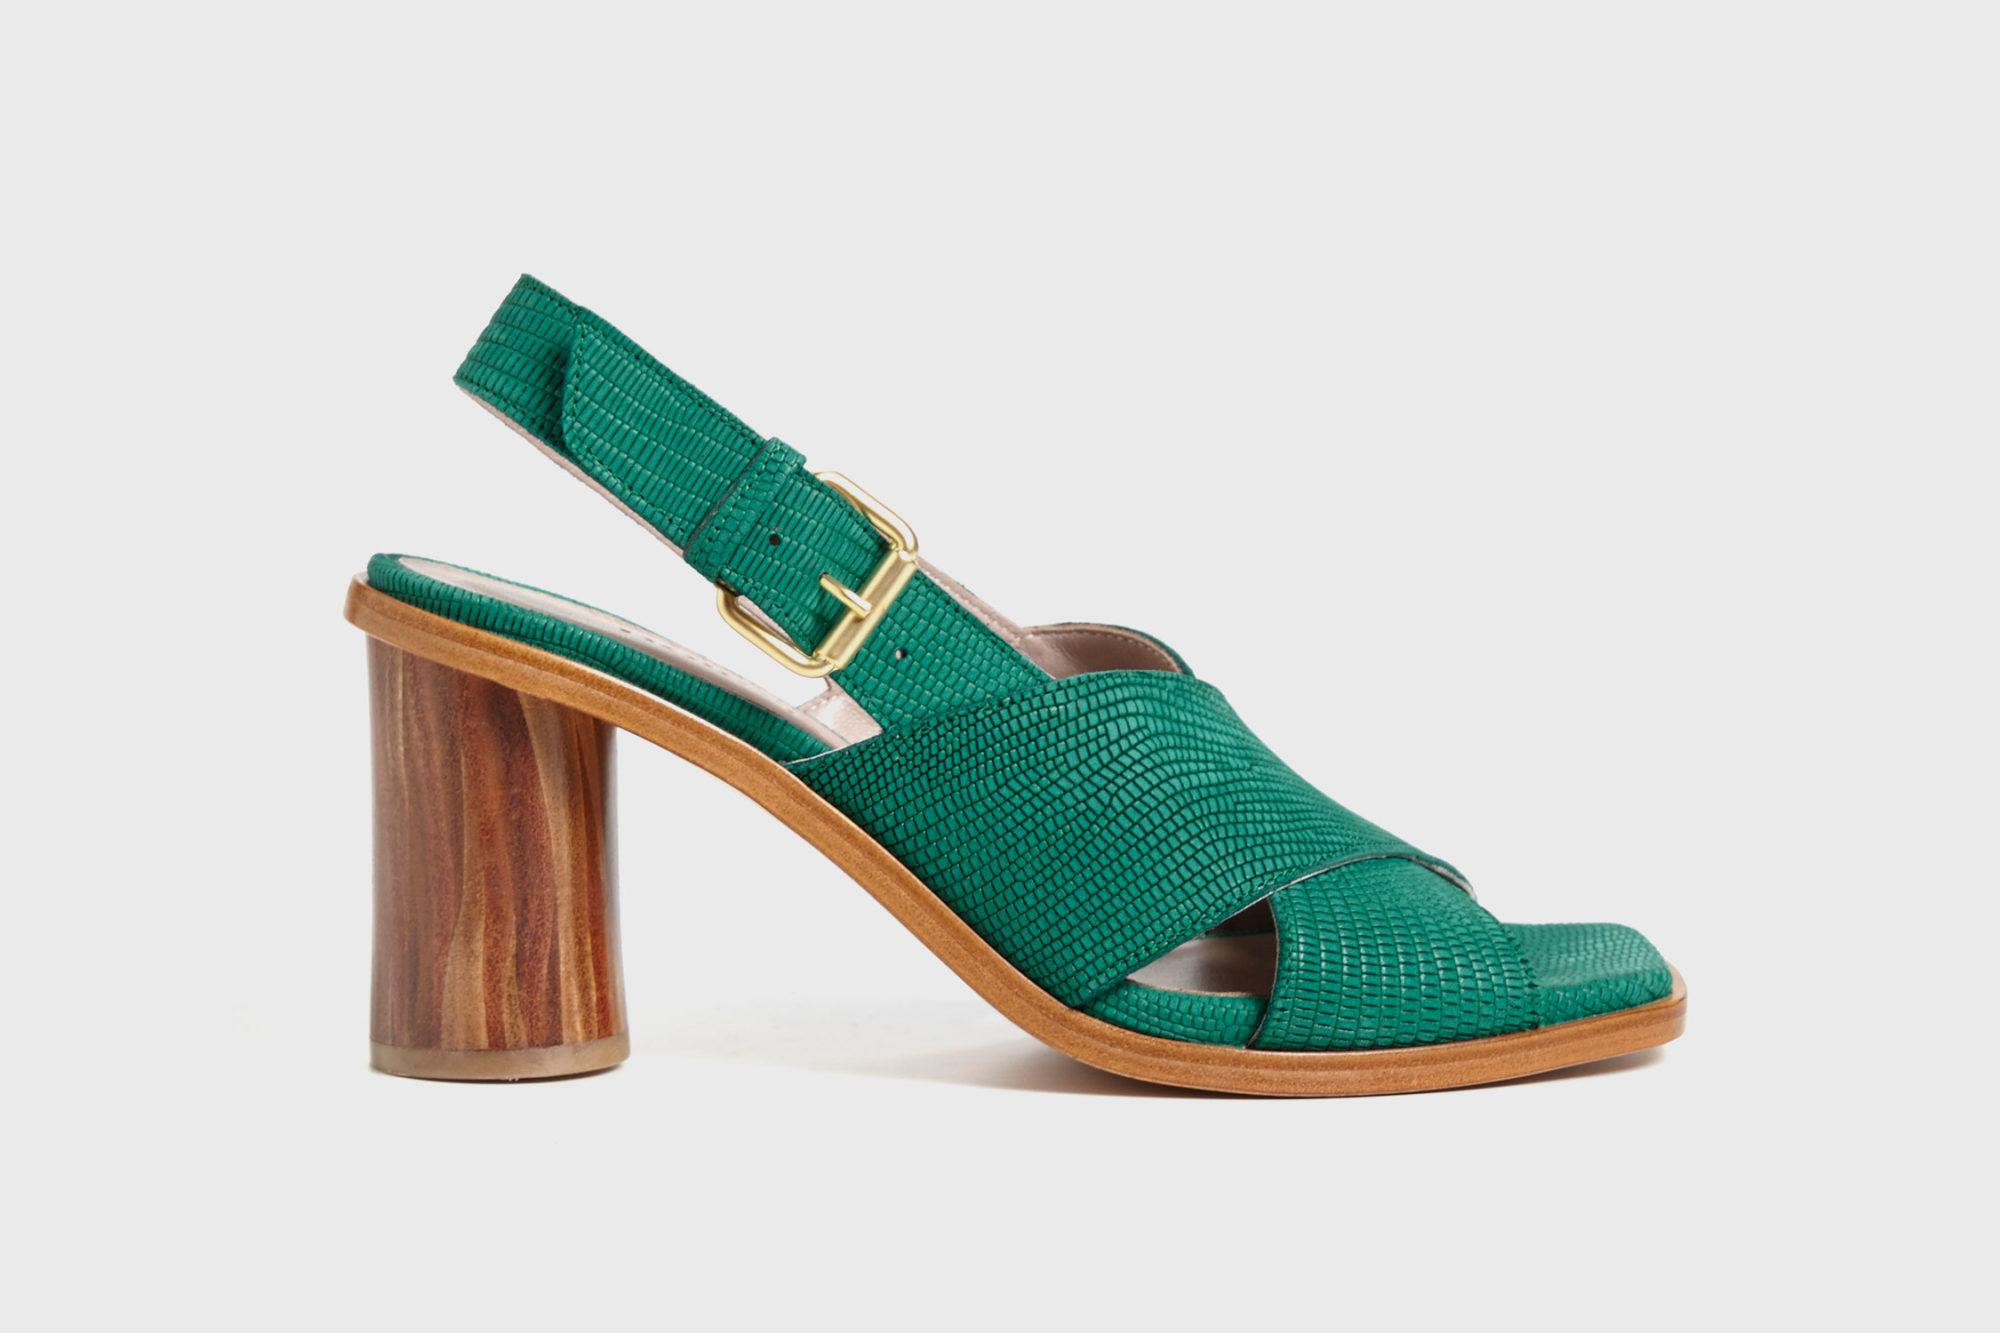 Dorotea sandalia de tacón alto Jazz verde ss17 perfil